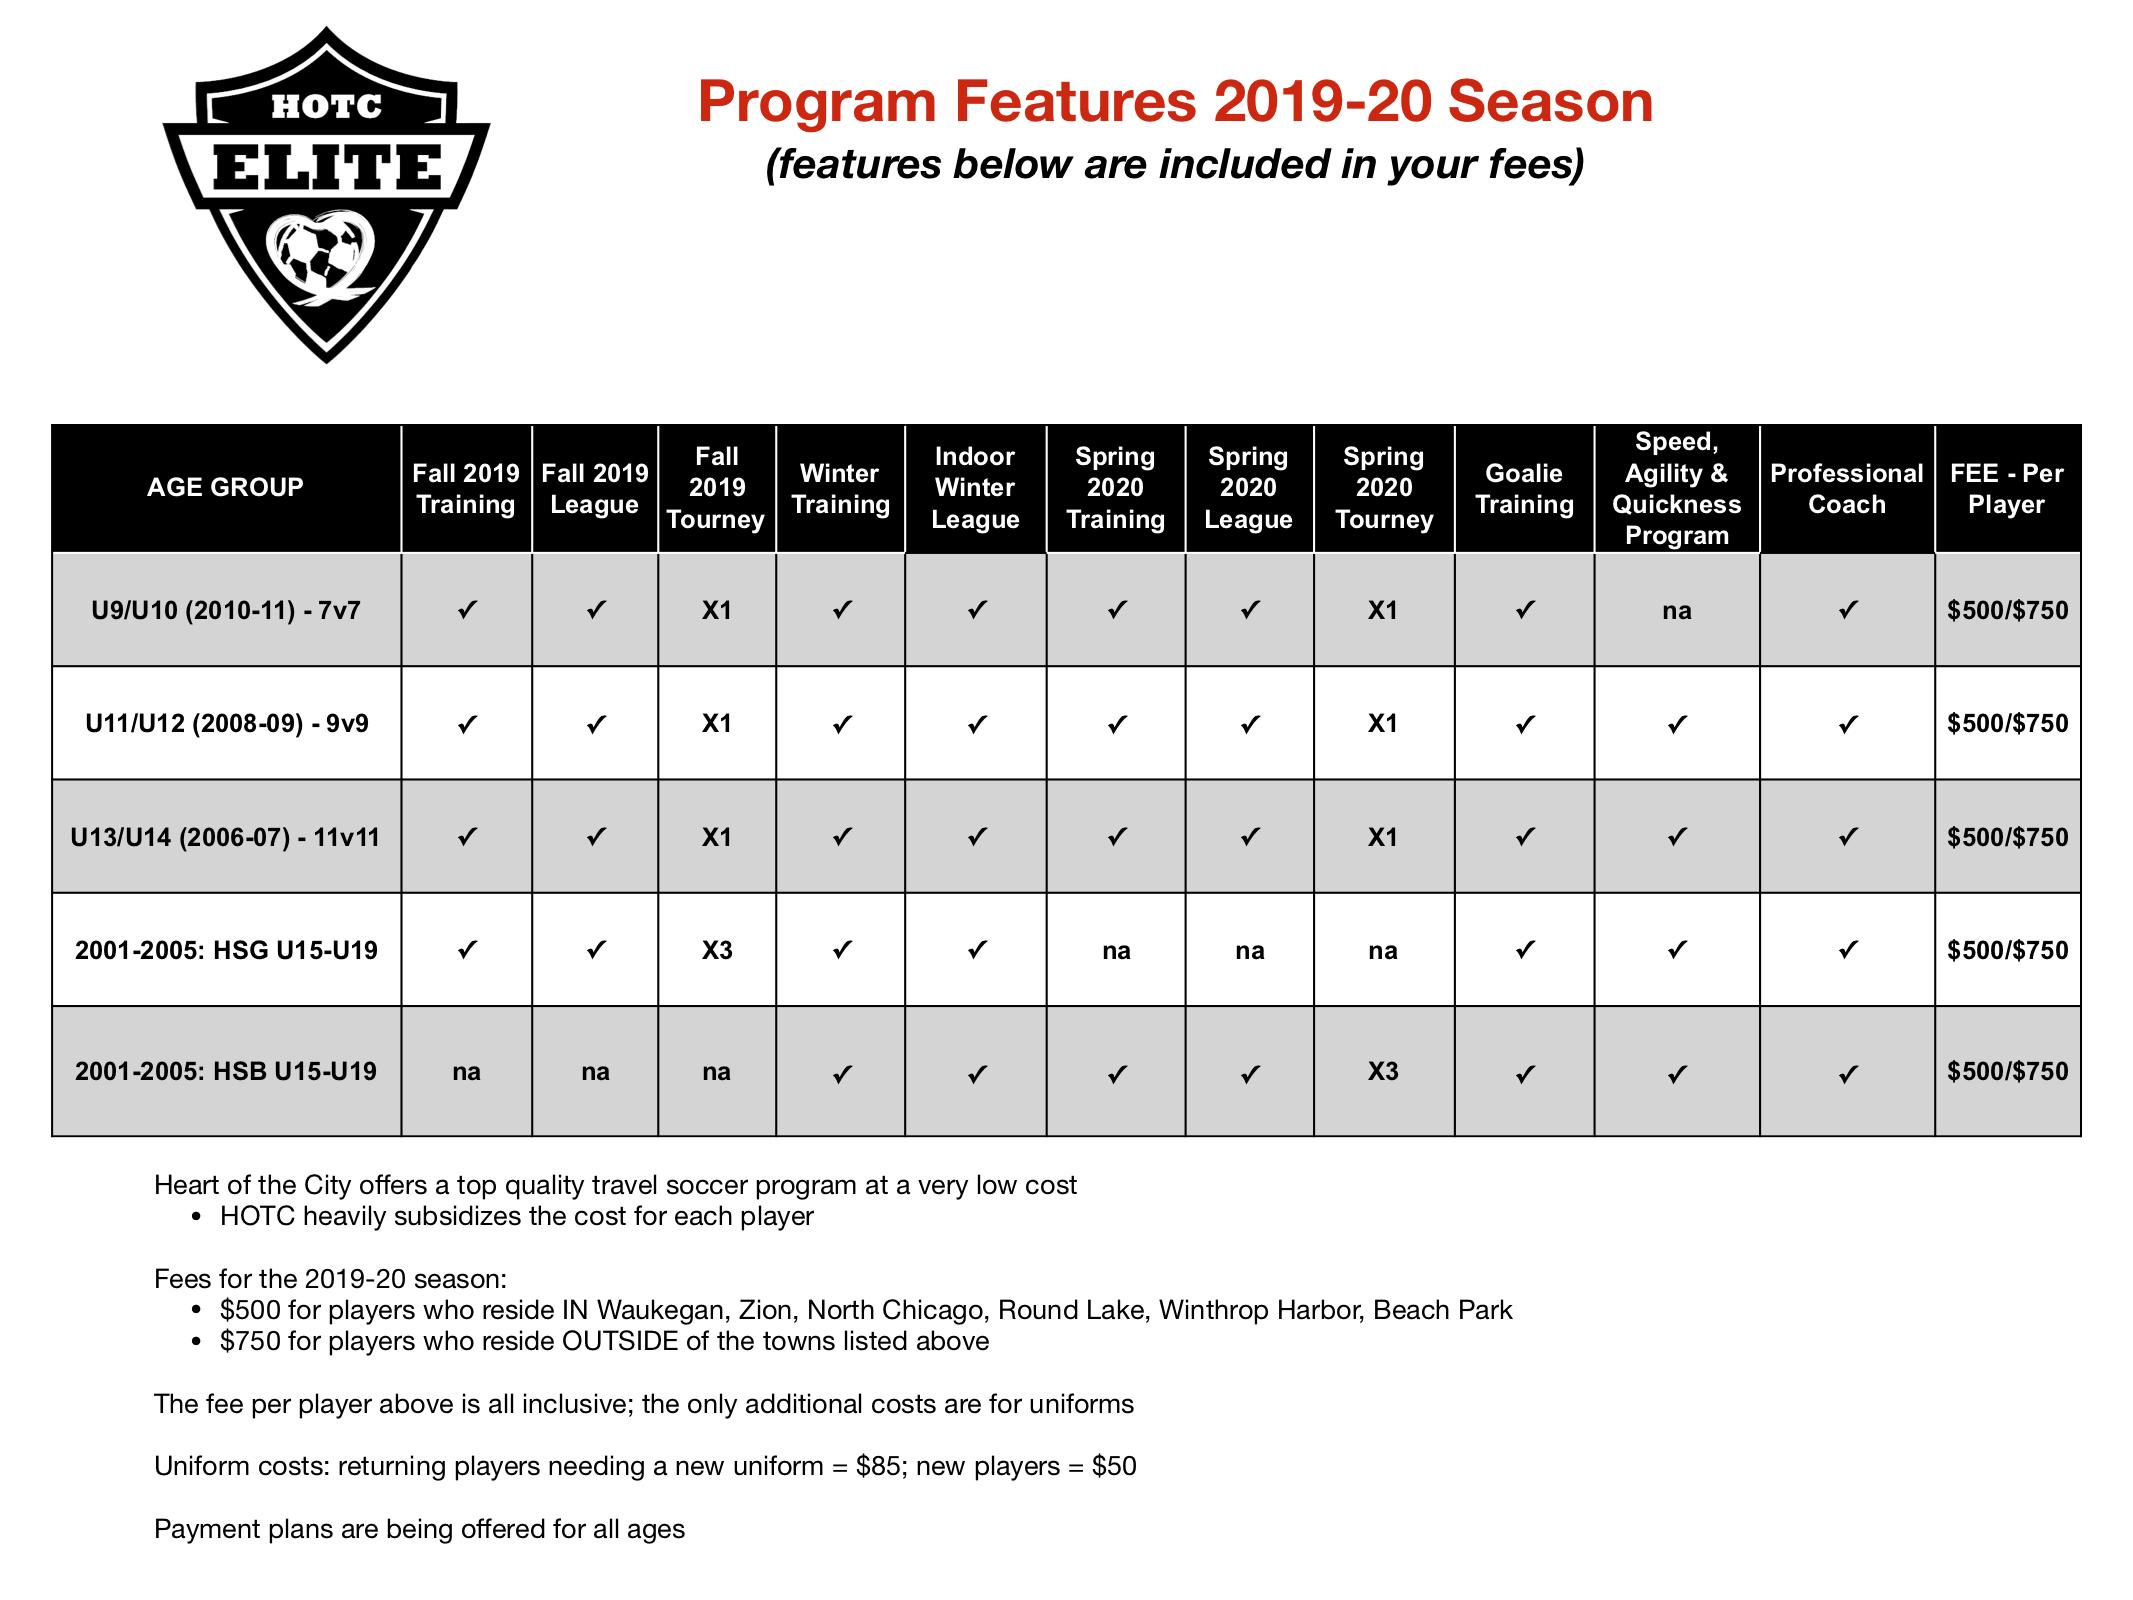 HOTC ELITE program features 2019-20